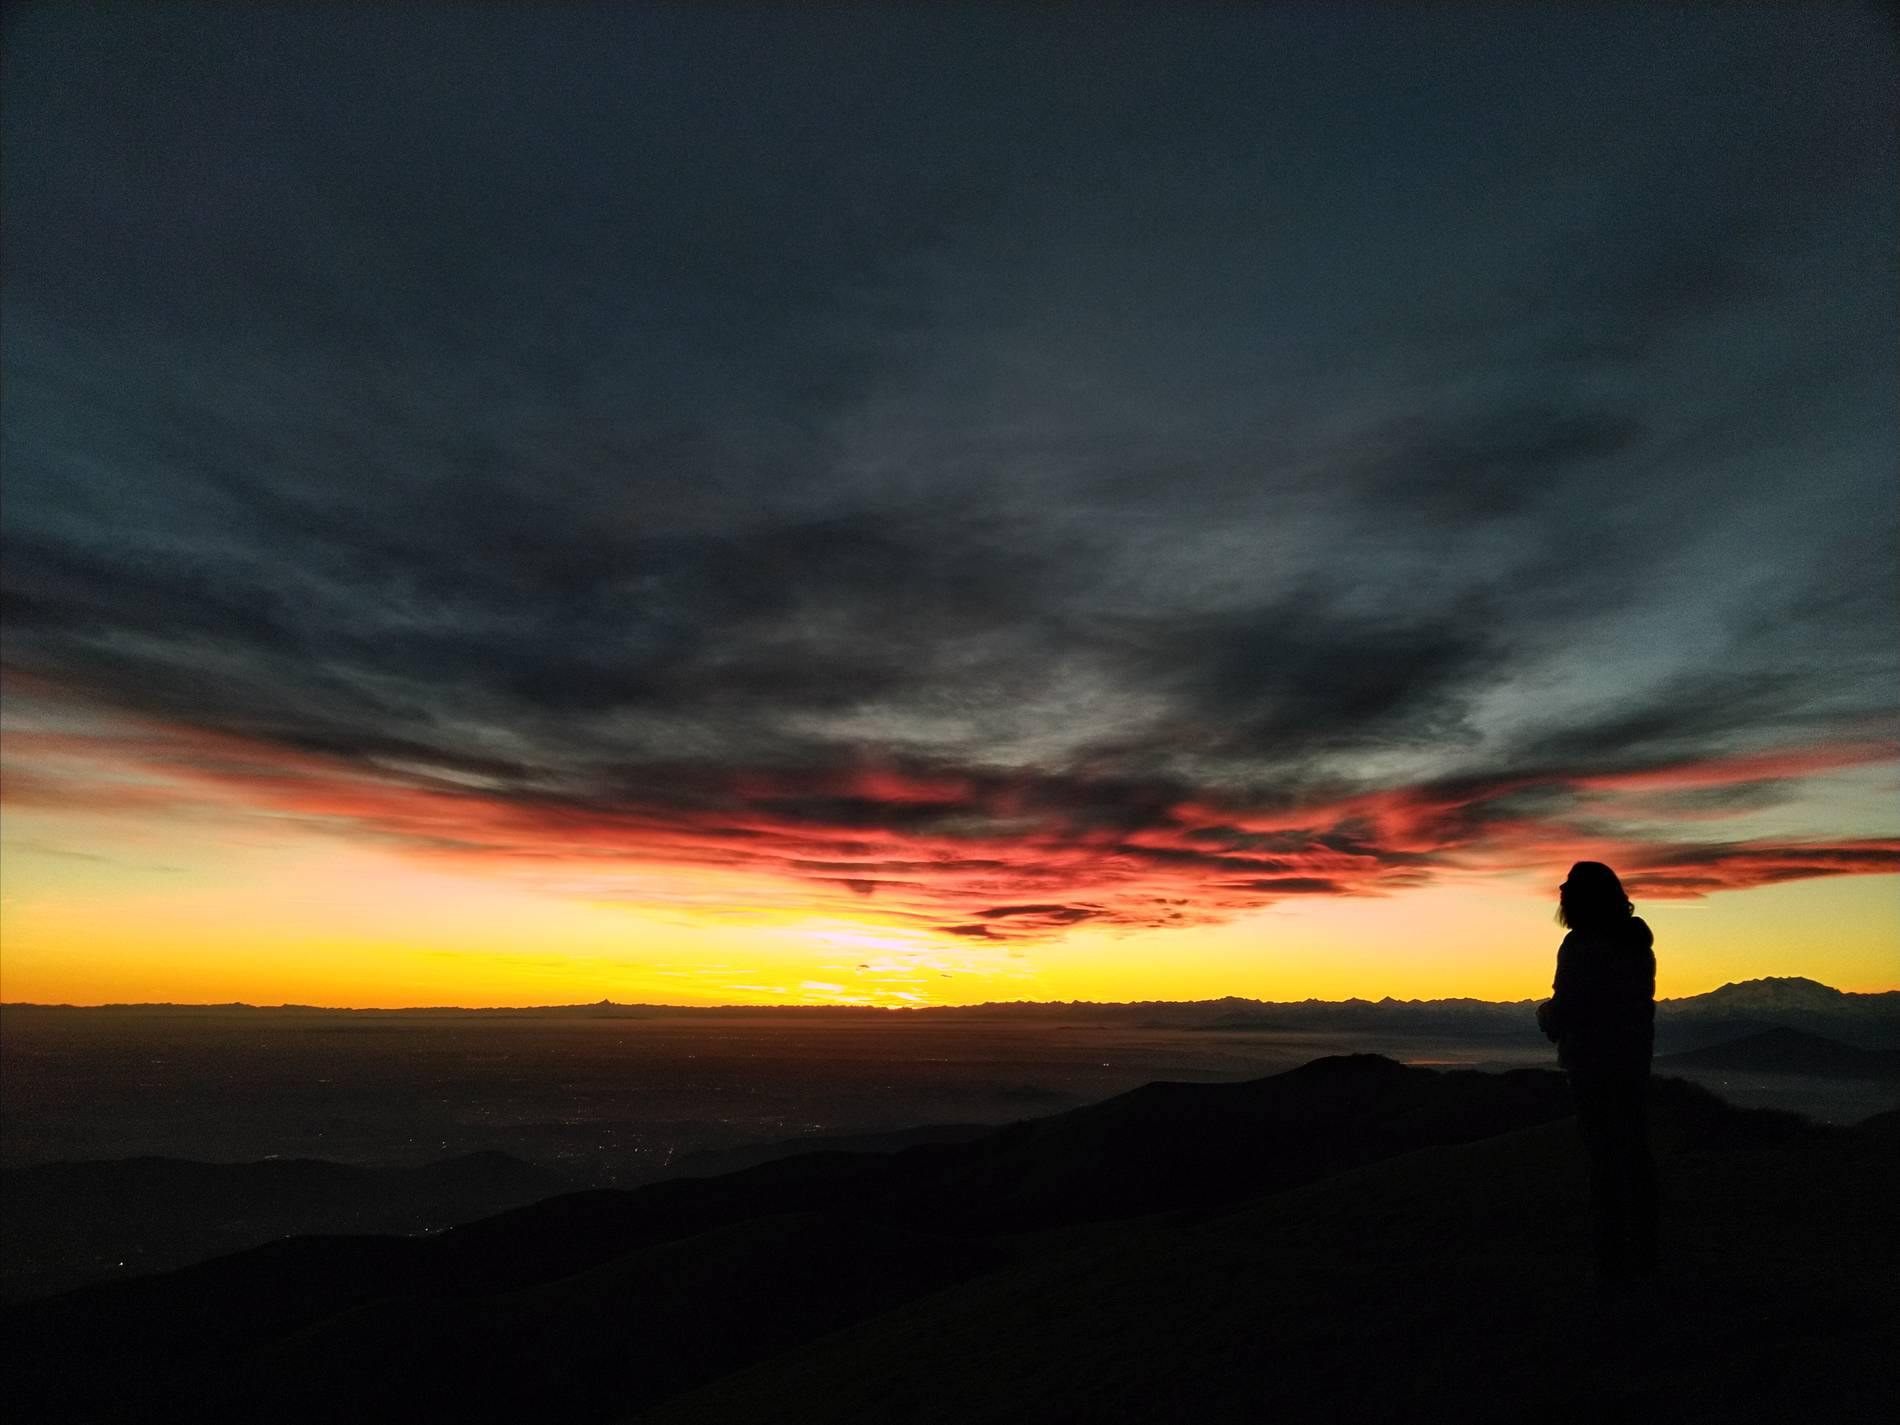 Un weekend in montagna con le ciaspole... ma anche senza